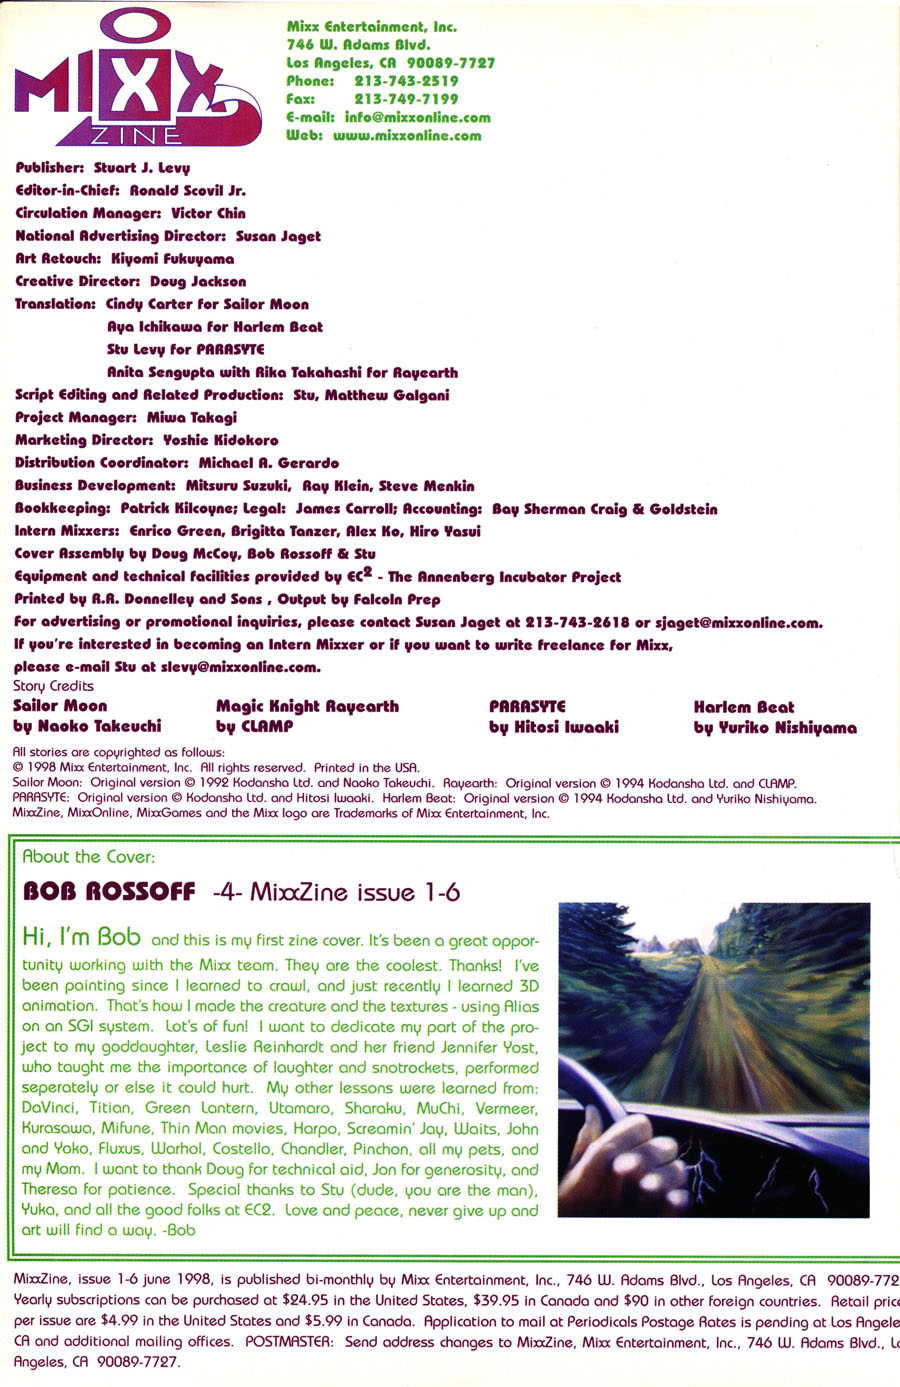 mixx-zine-issue-6-june-1998-contents